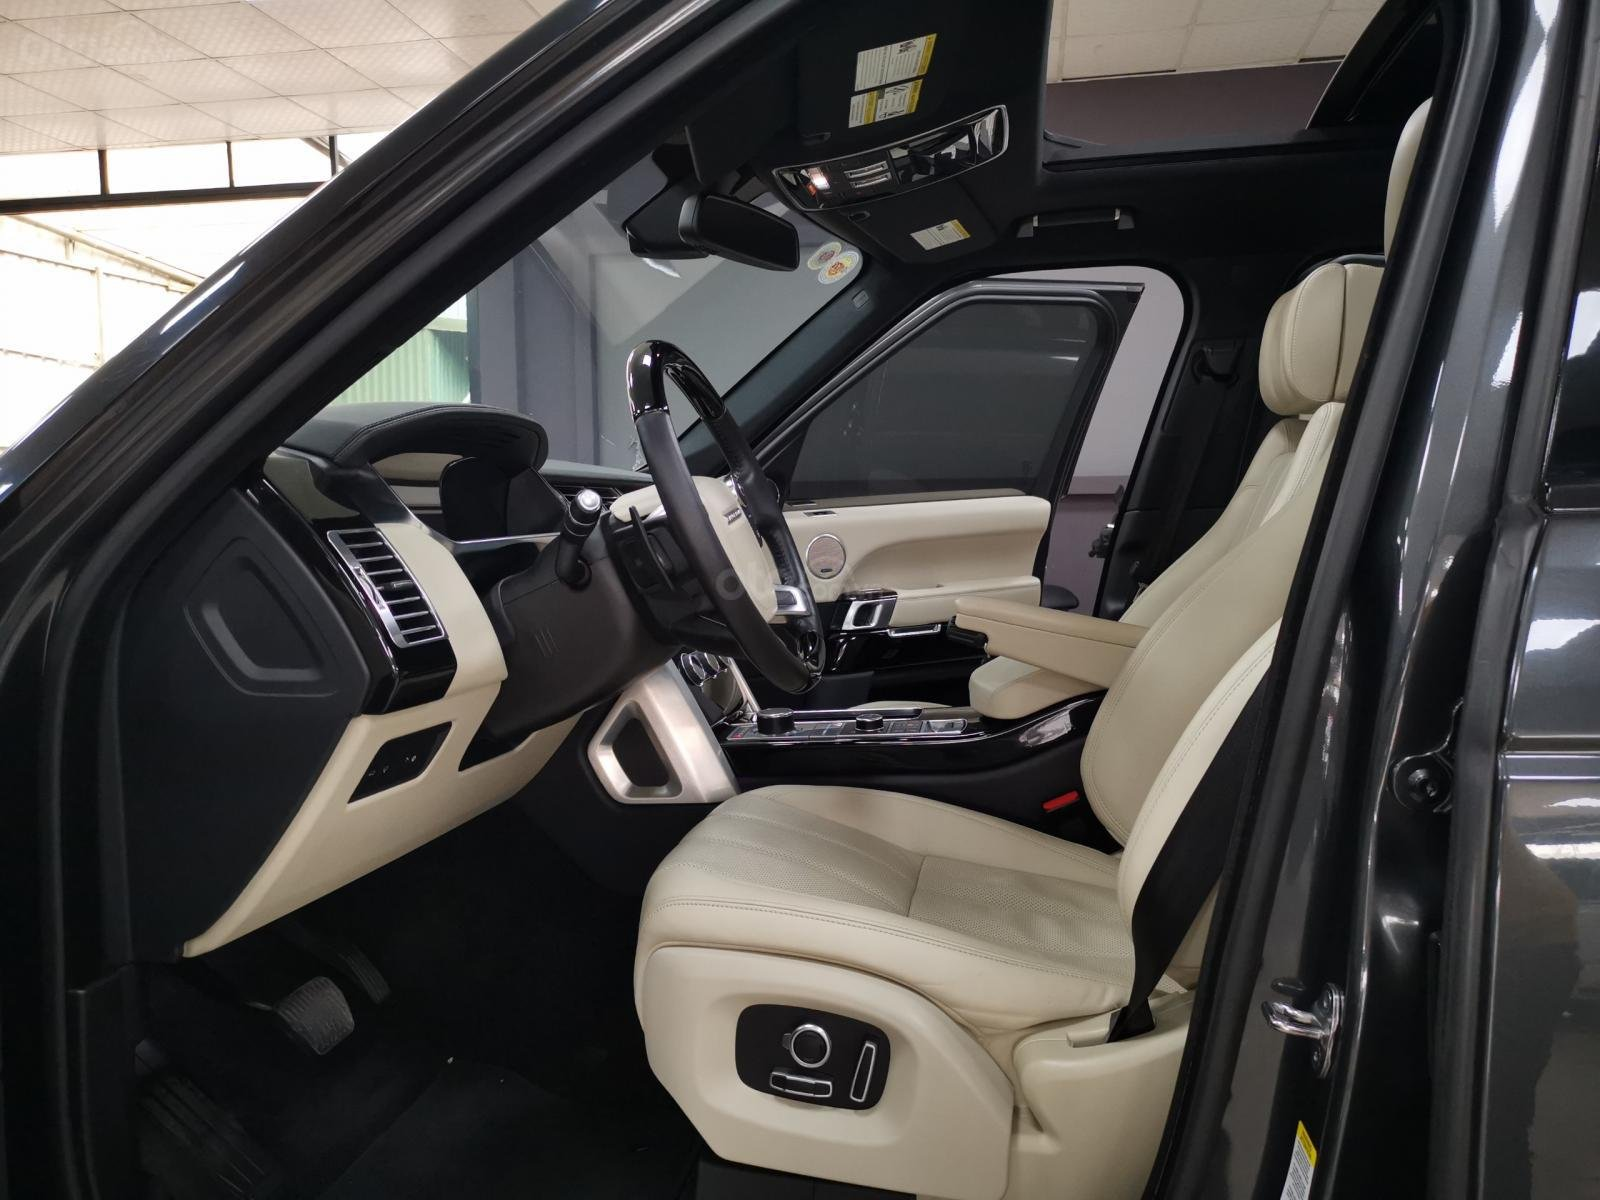 Bán nhanh chiếc LandRover Ranger Rover model 2019 (5)